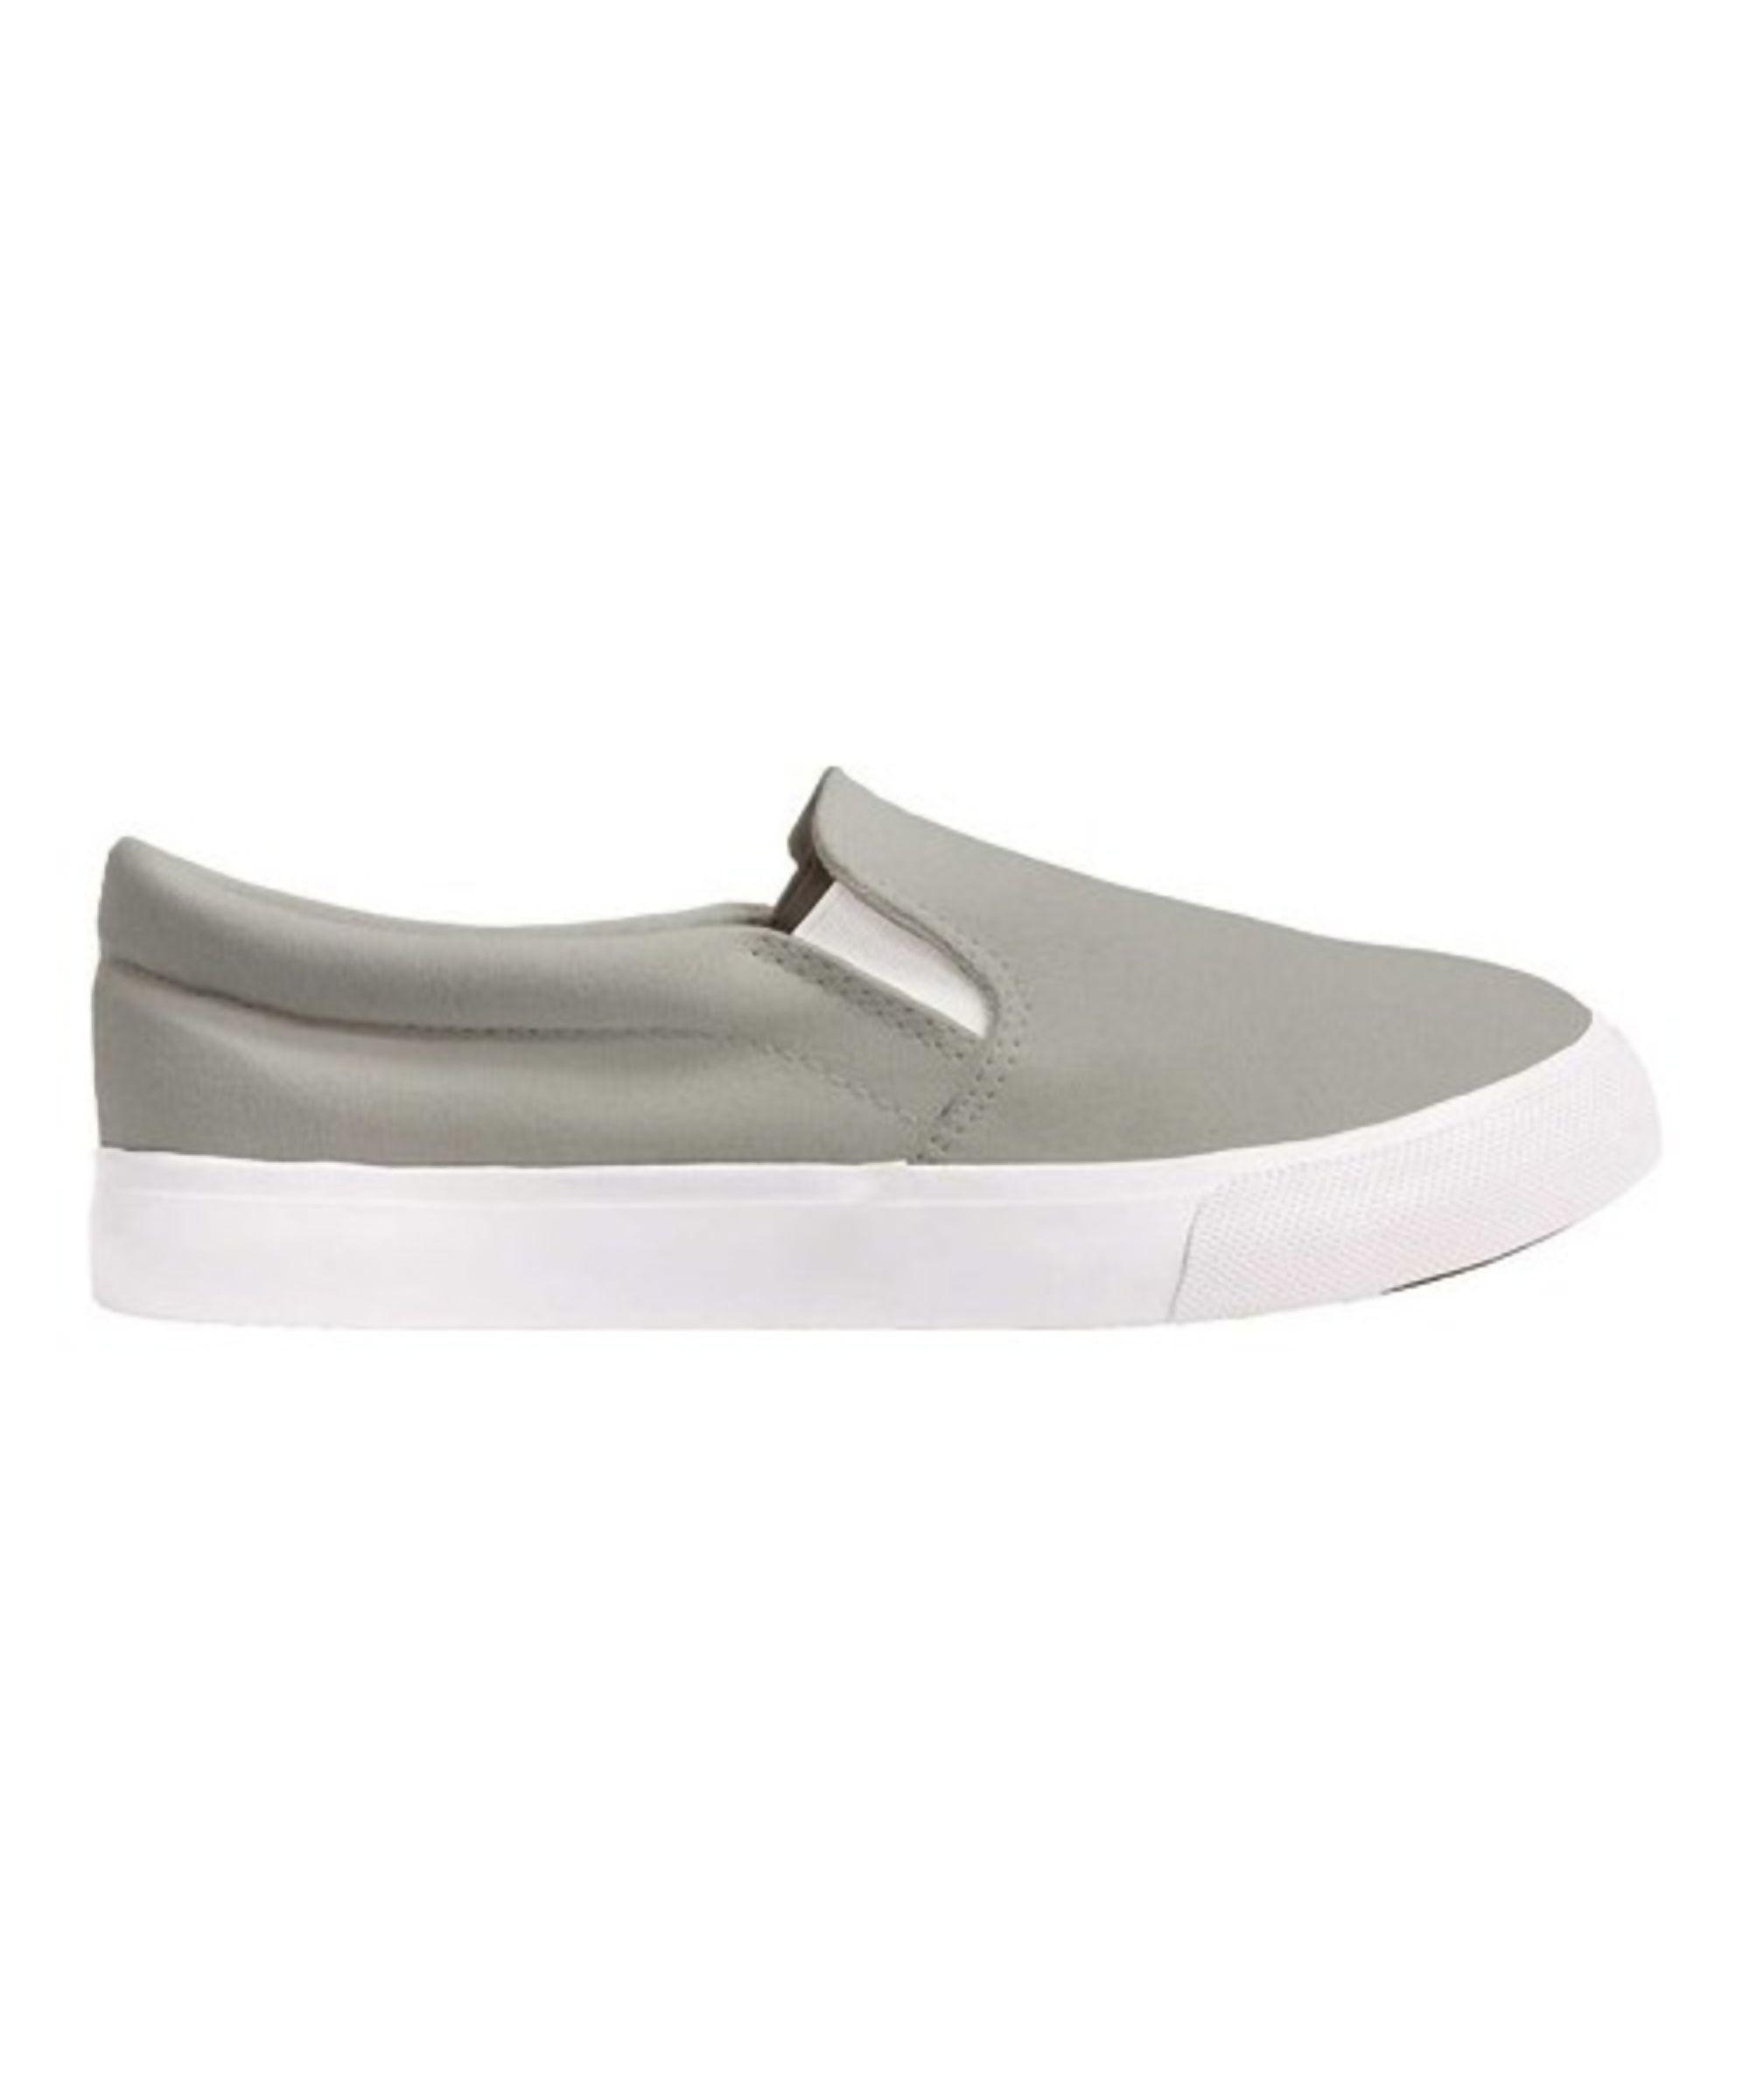 Lamo Piper Slip On Sneaker(Women's) -Grey Online Store Pre Order Online Sale Footlocker Finishline Online Shop FNMBg